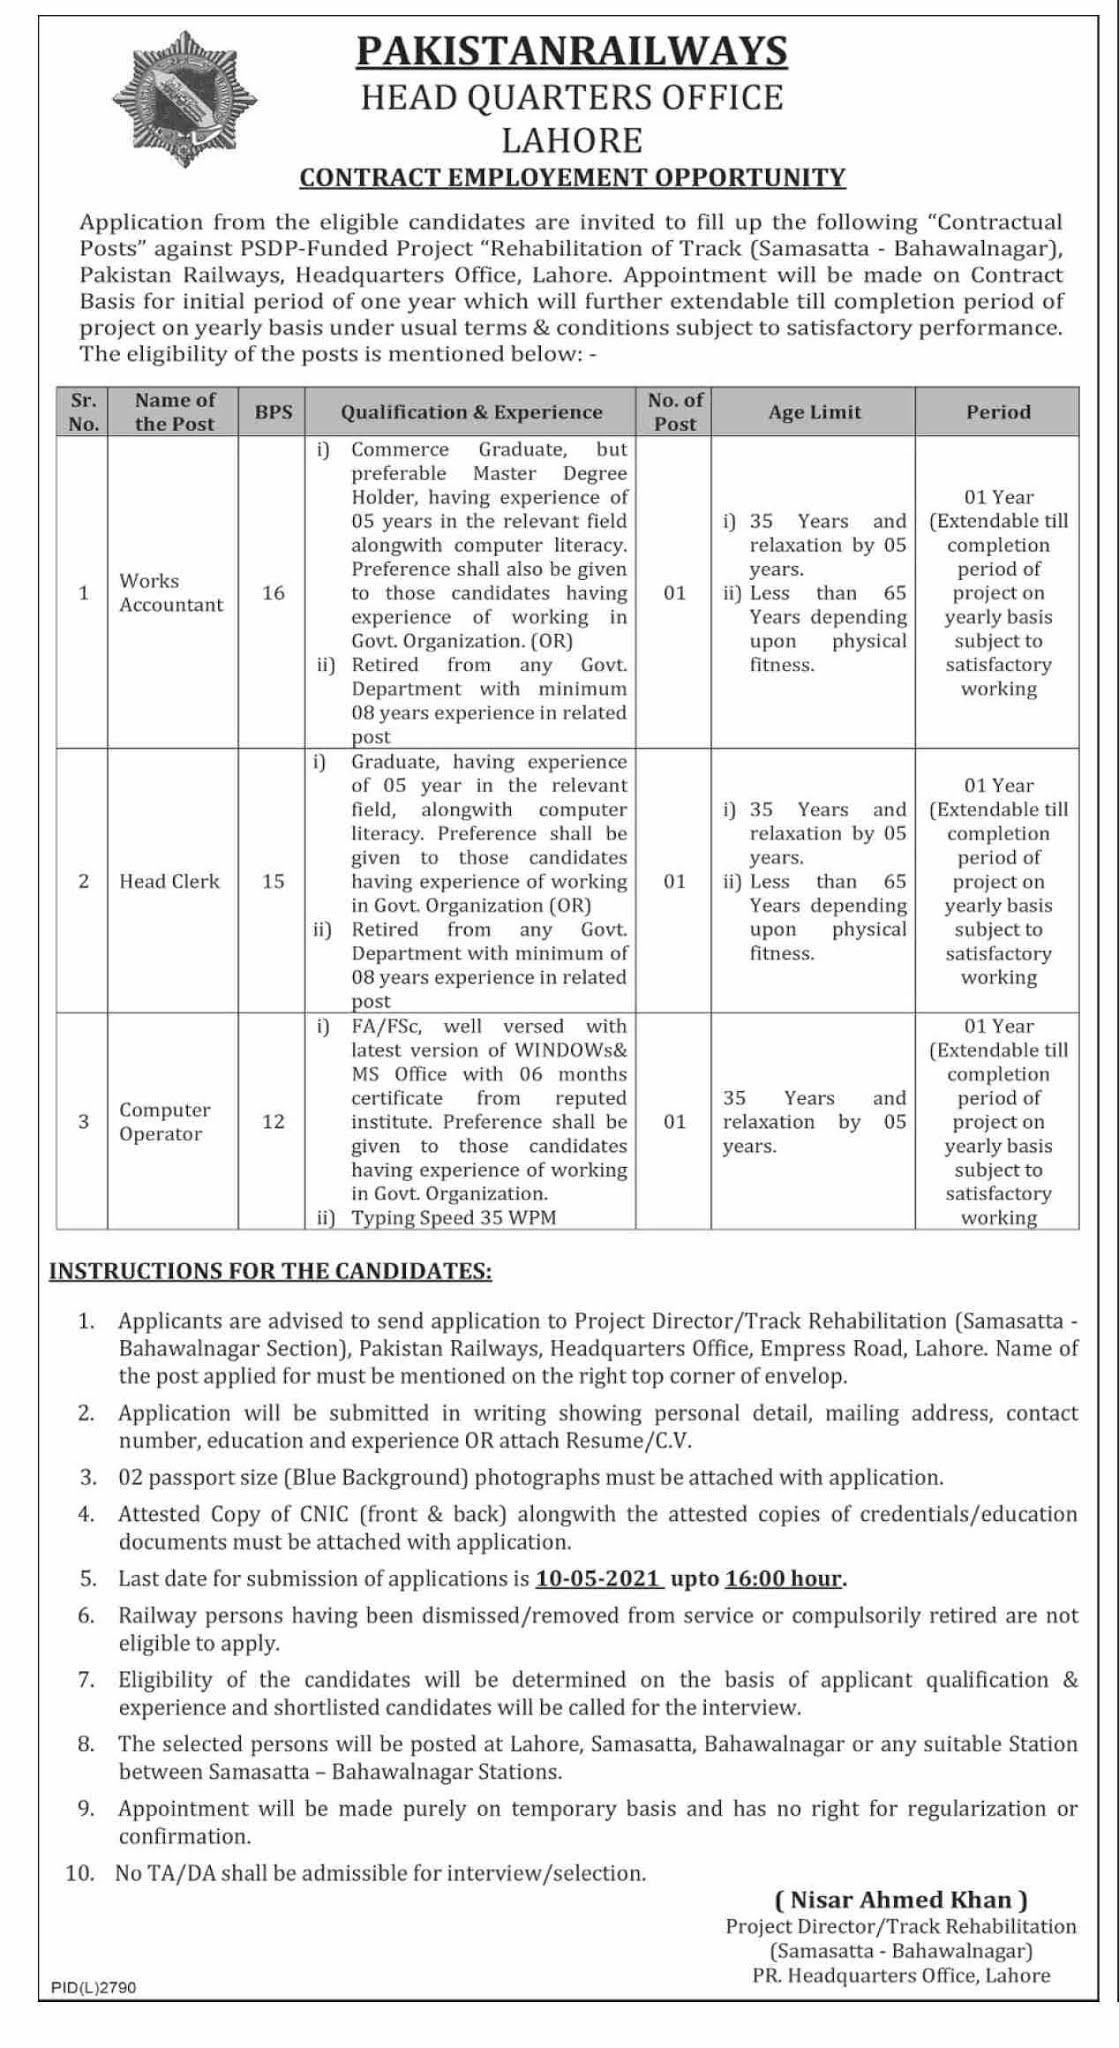 Pak Railway Jobs 2021 - New Railway Jobs 2021 - Latest Railway Jobs 2021 - Pakistan Railway Jobs 2021 in Pakistan